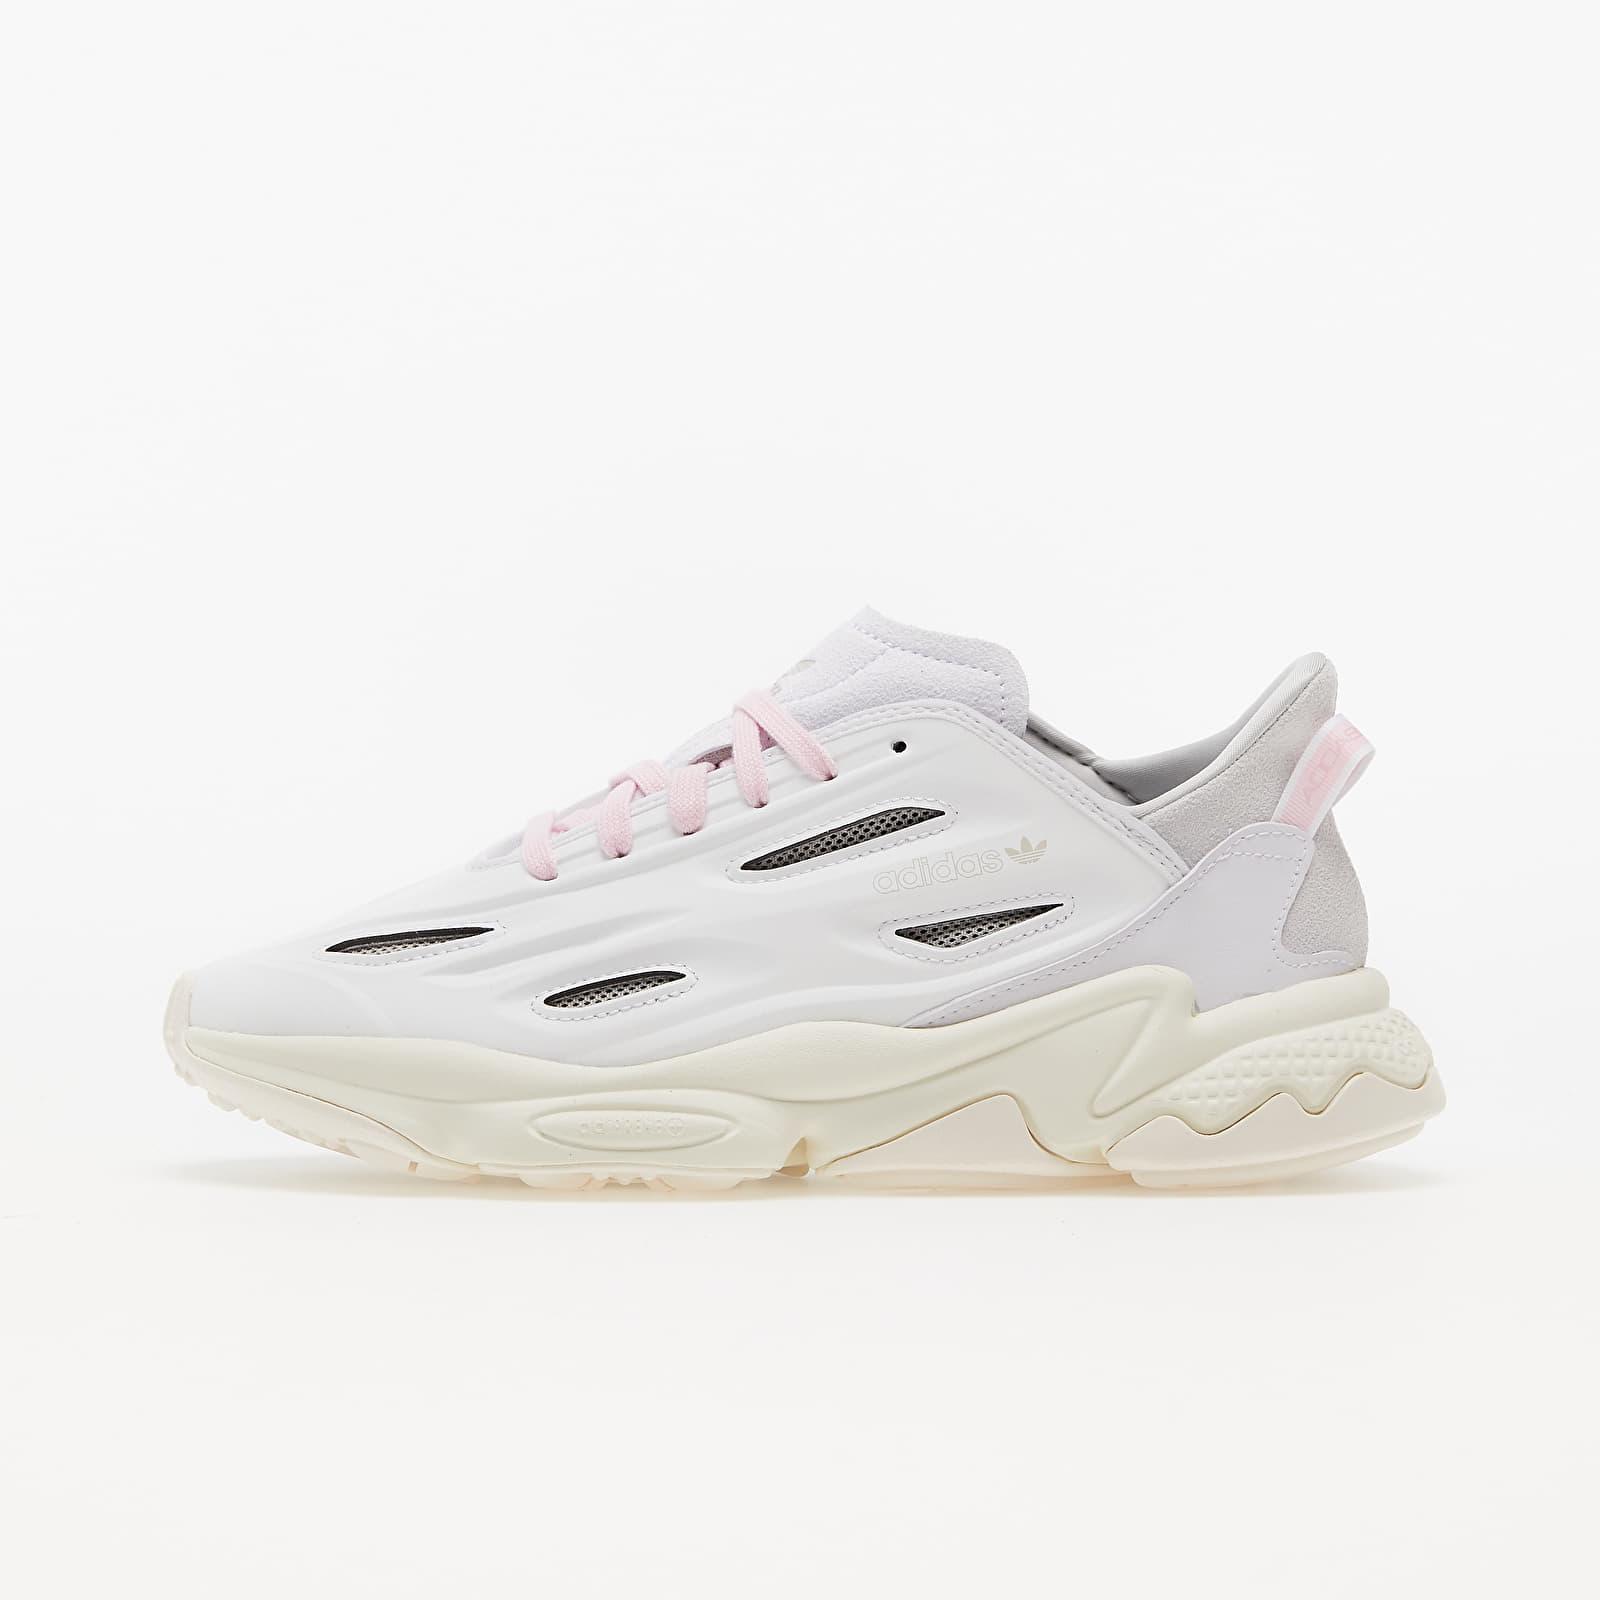 adidas Ozweego Celox W Ftw White/ Ftw White/ Clear Pink EUR 37 1/3